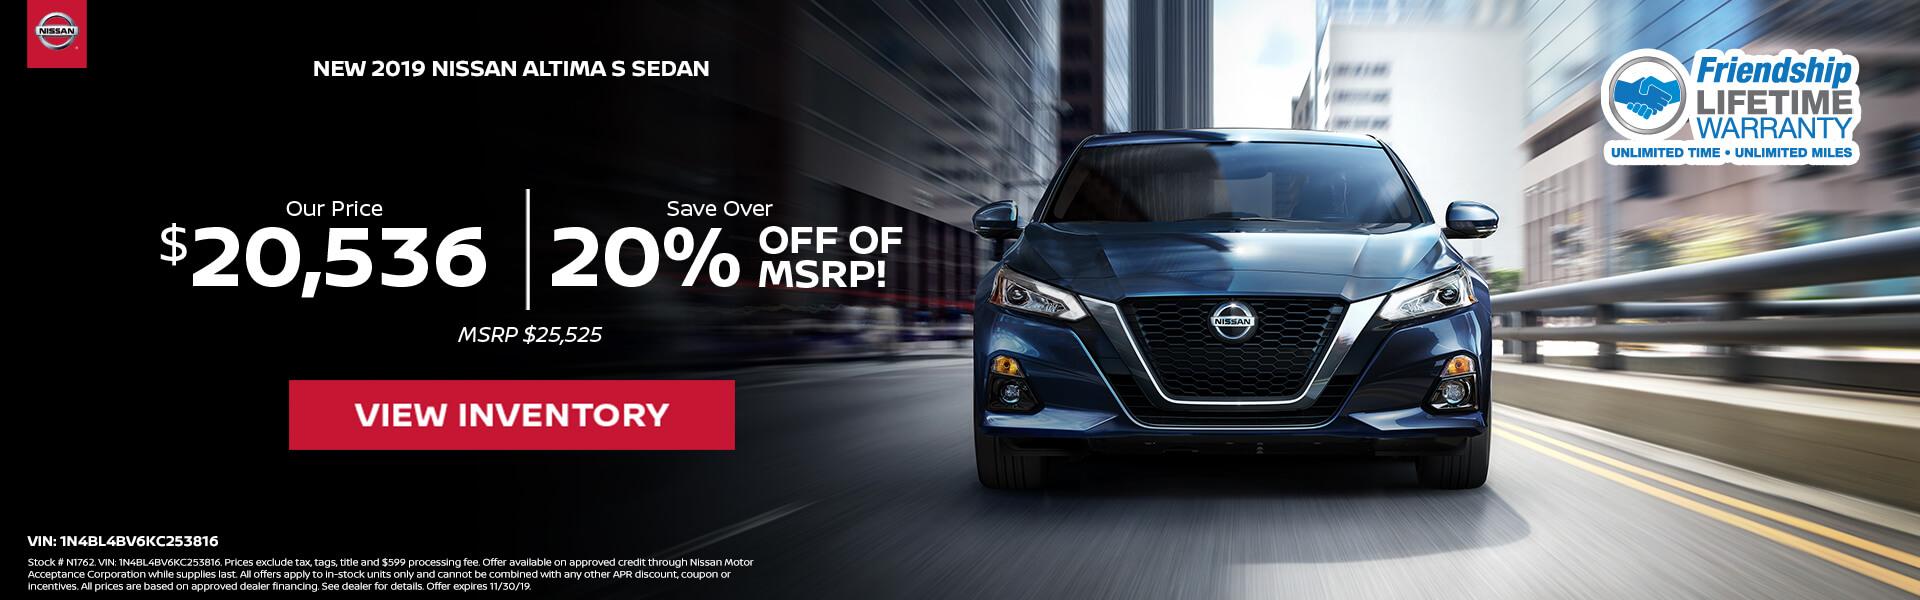 Nissan Altima $20,536 Purchase